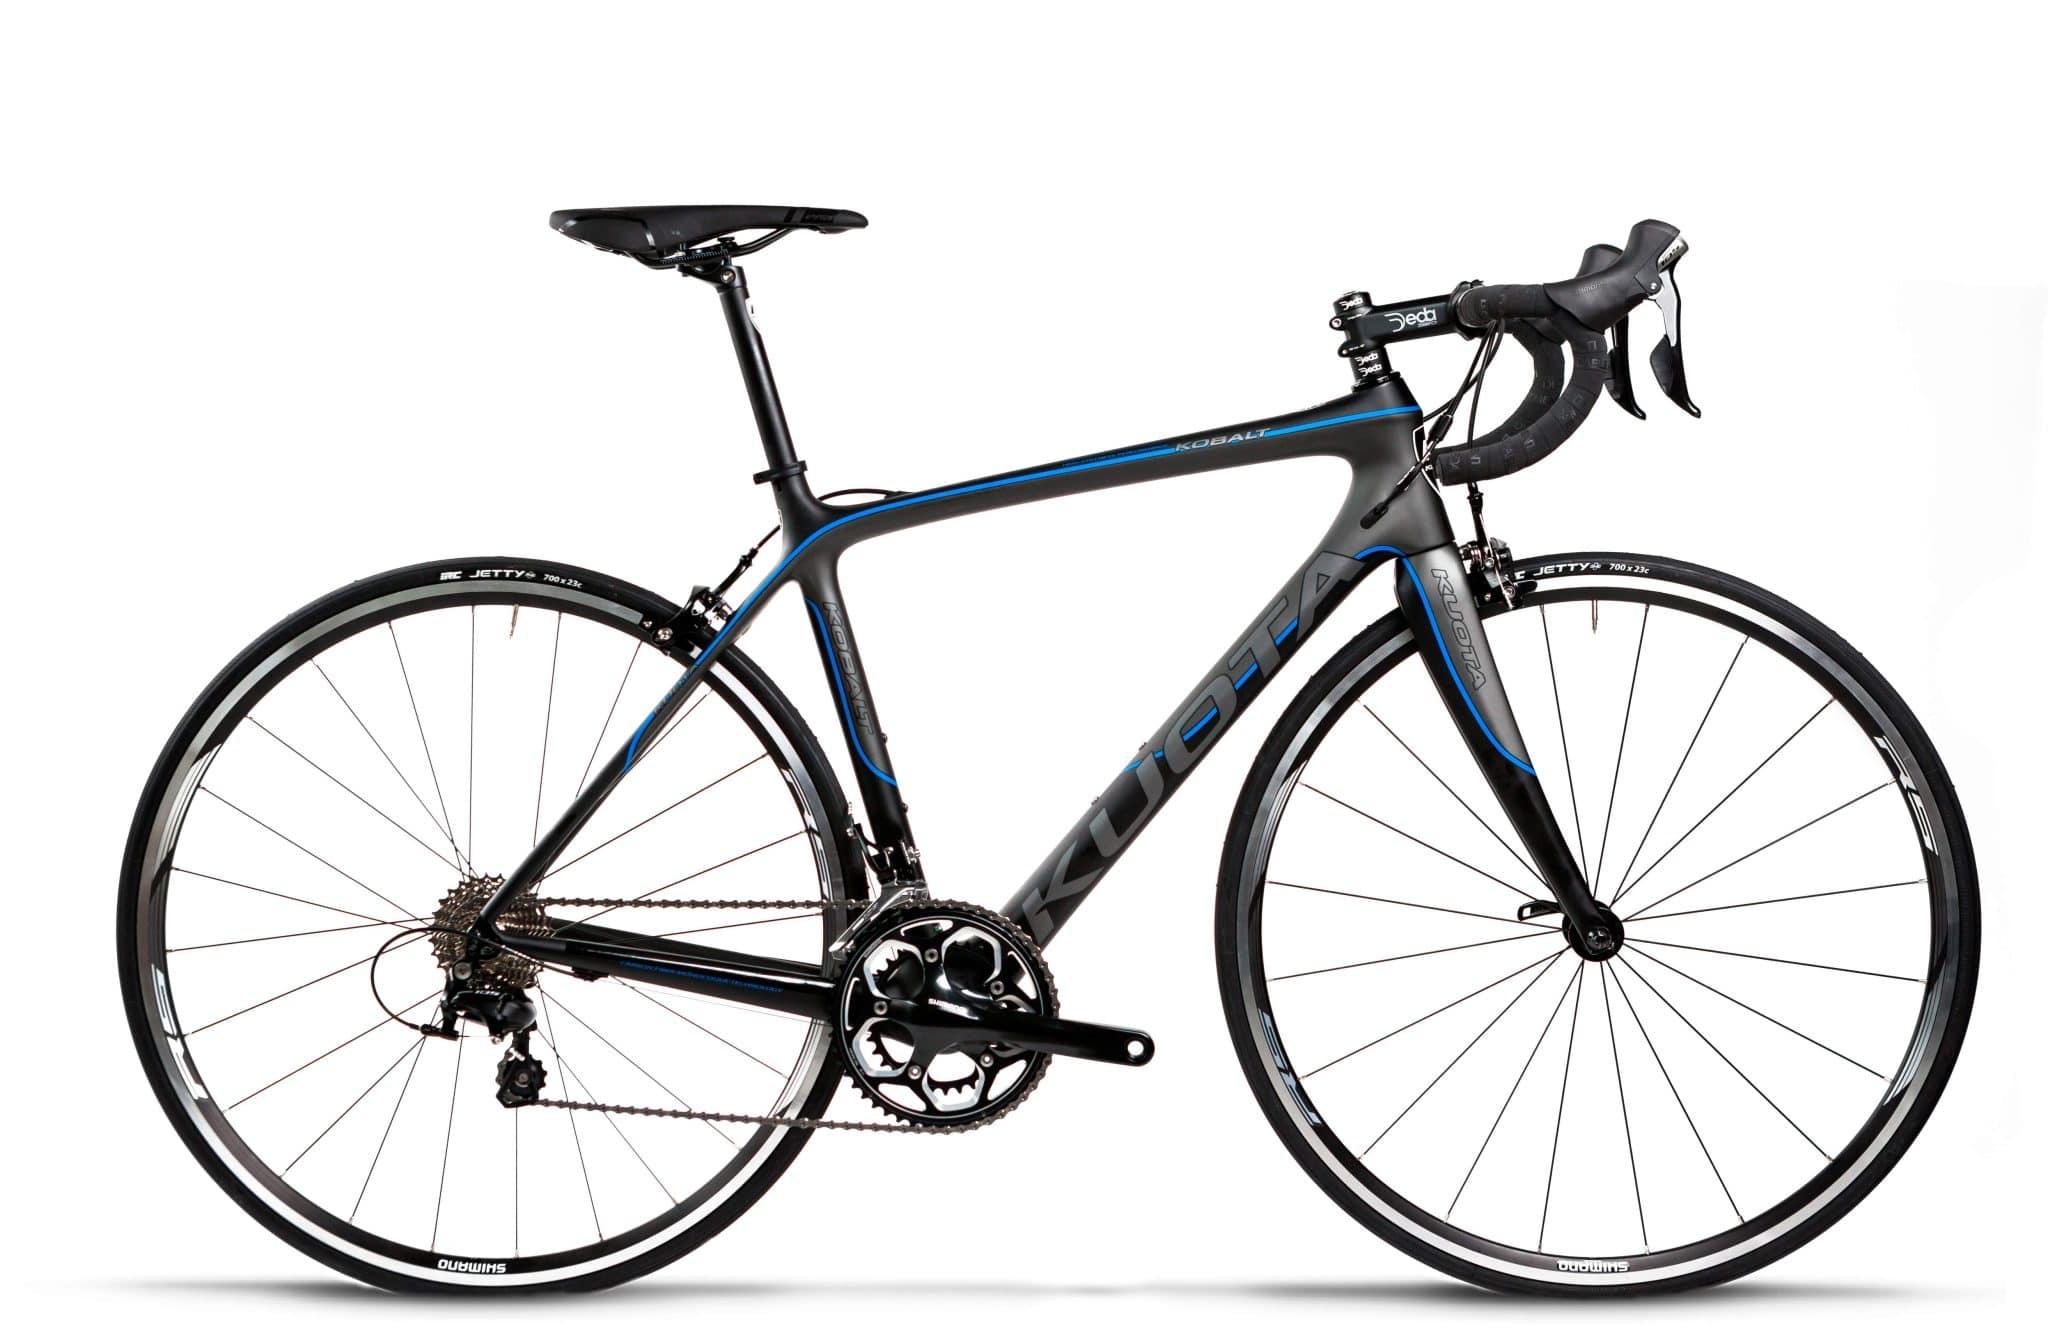 Bicicleta de carretera Kuota KOBALT 2016. NUEVA !!!